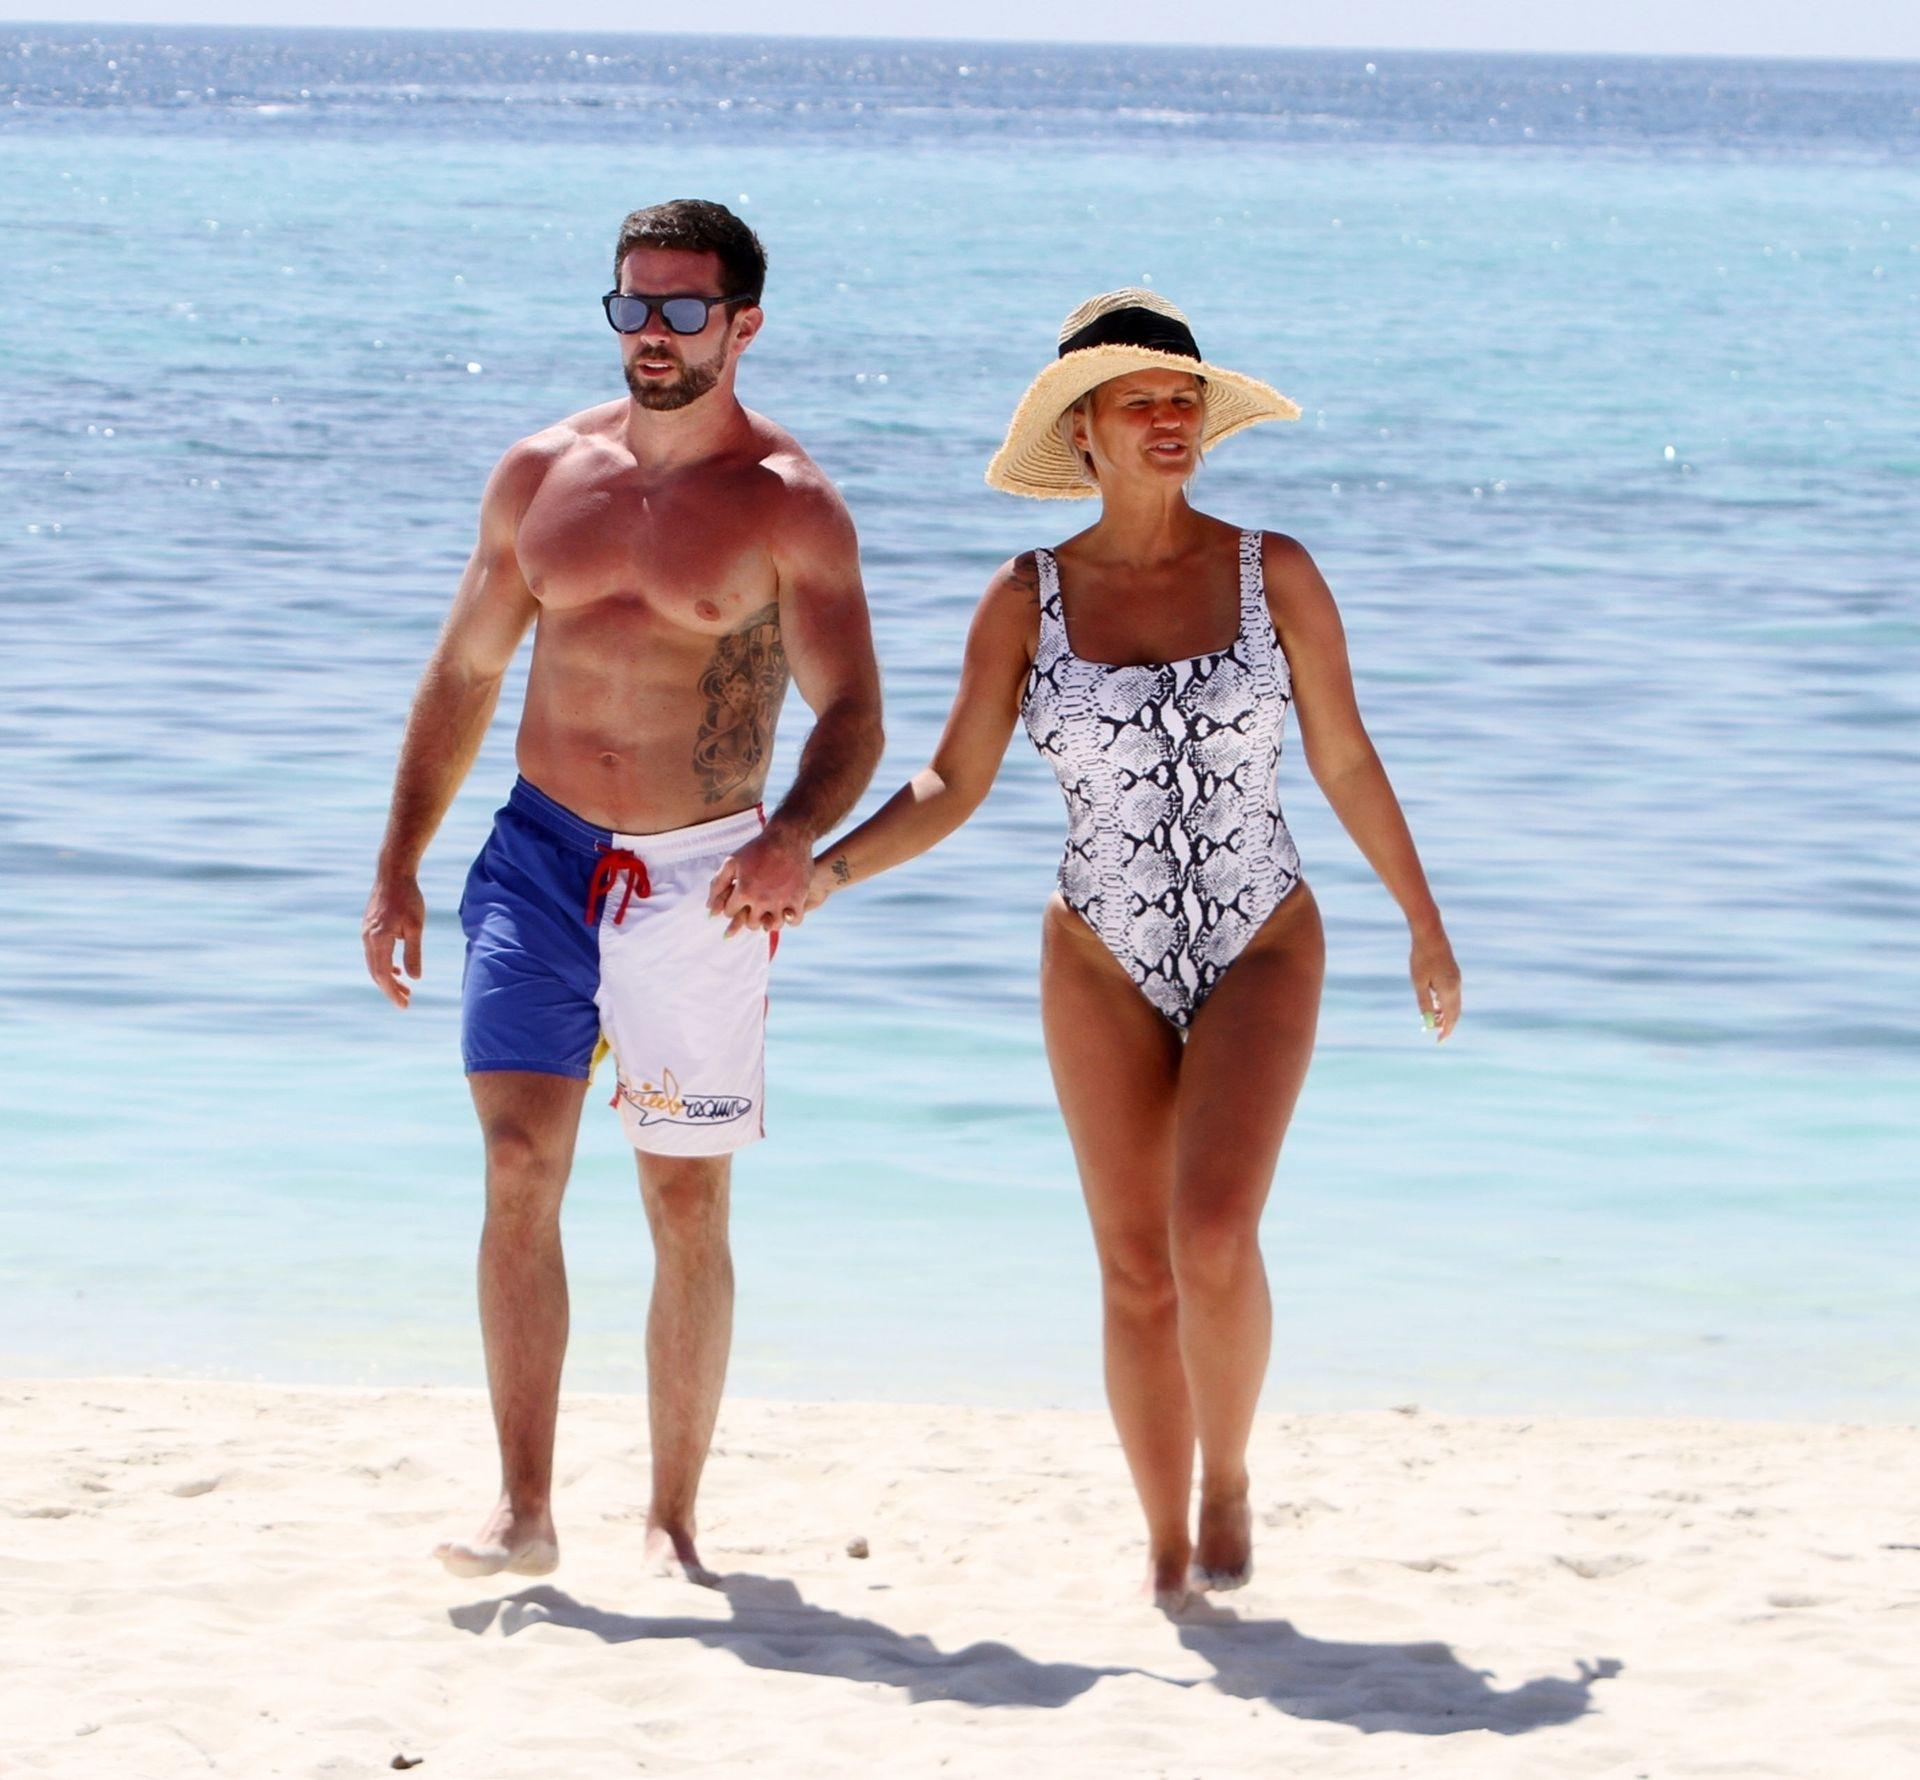 Kerry Katona & Ryan Mahoney Hit The Beach On Holiday At Their Luxury 5 Star Resort Ayada Maldives 0008